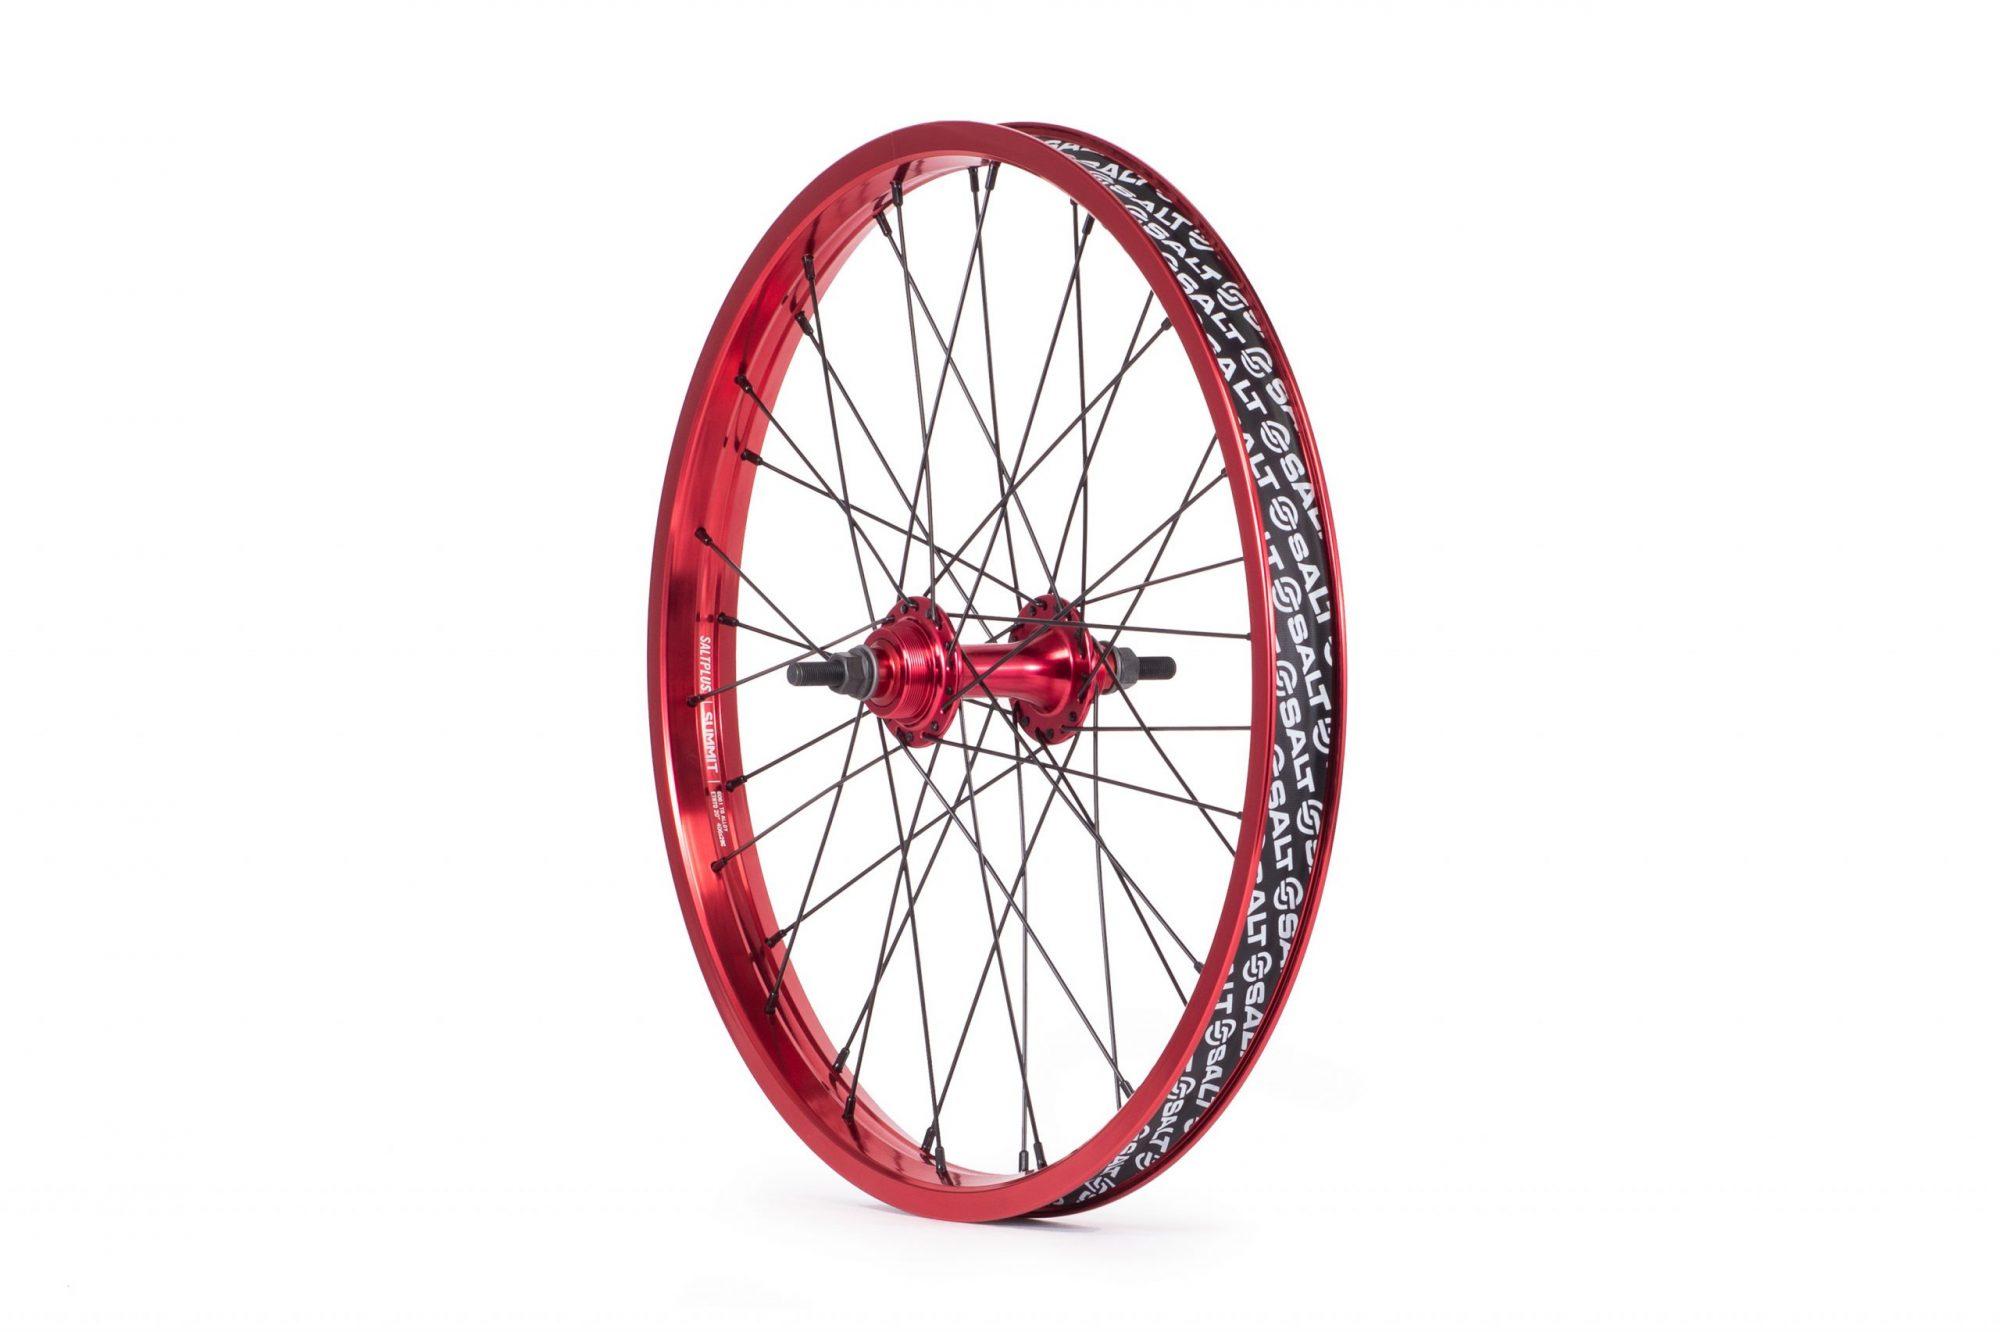 Salt_Everest_flipflop_rear_wheel_red_02